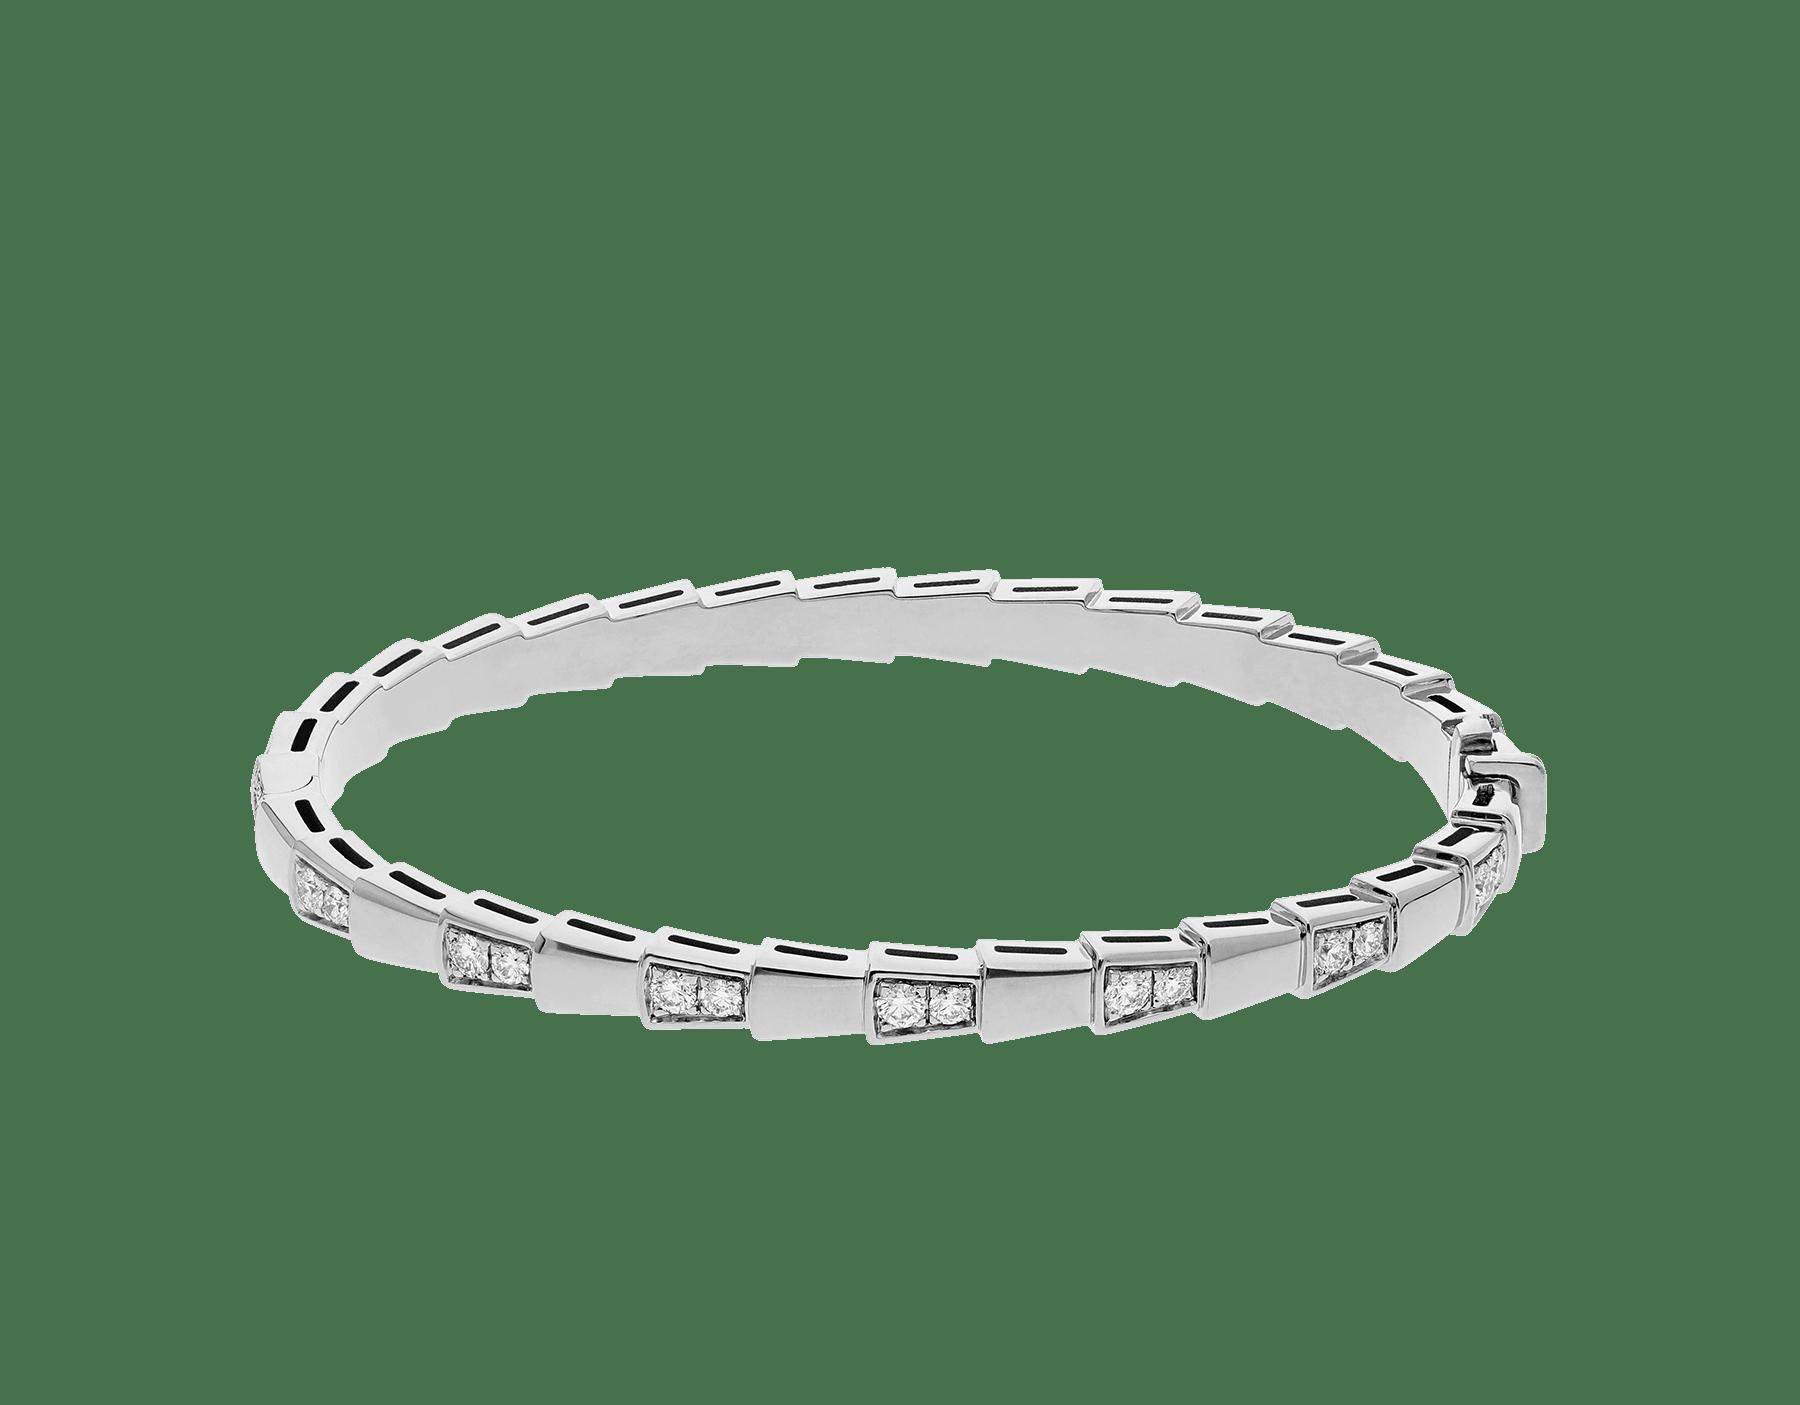 Serpenti Viper 18 kt white gold bracelet set with demi-pavé diamonds. (width 4 mm) BR858420 image 2